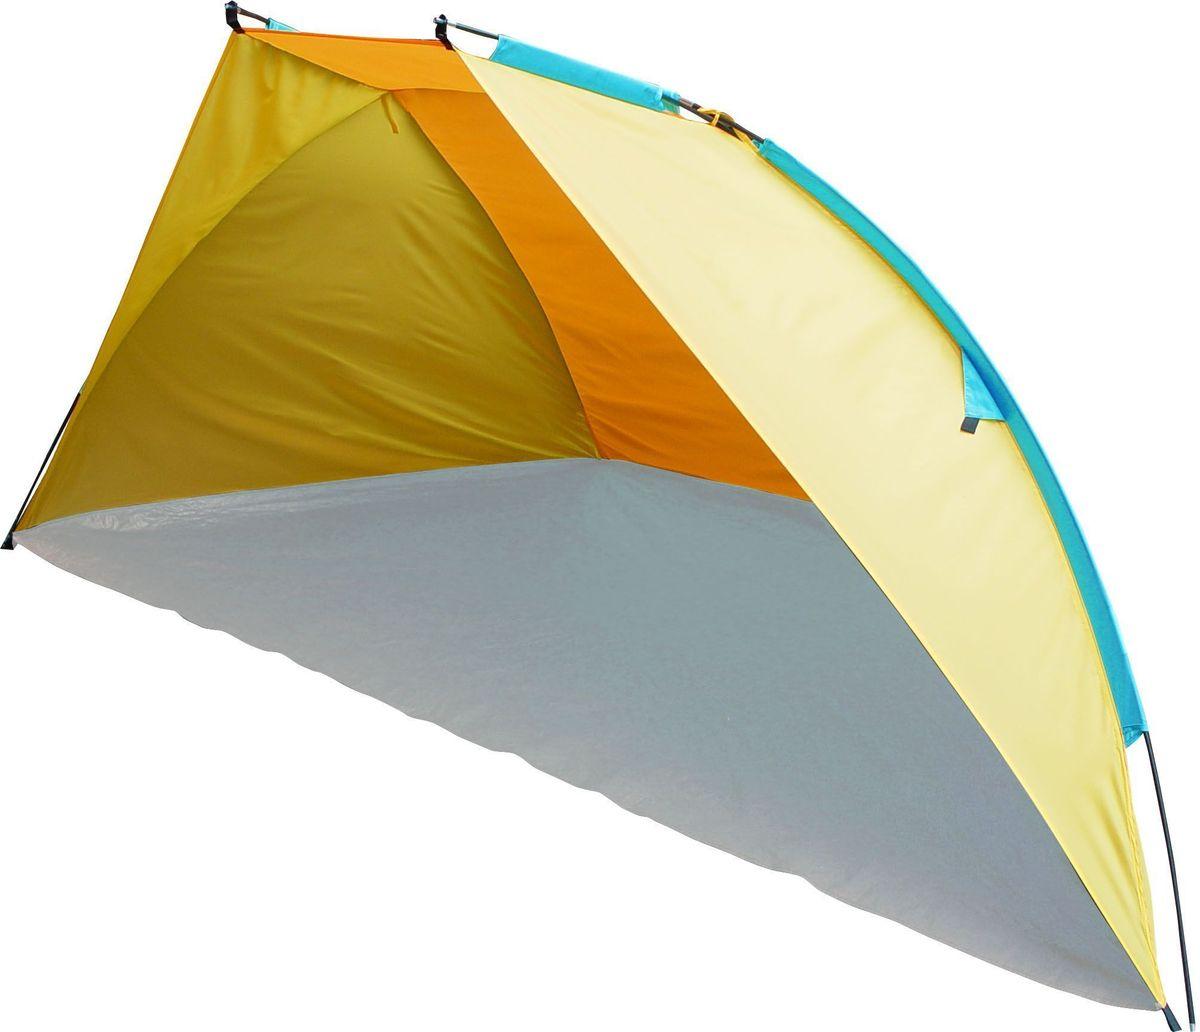 Тент пляжный GoGarden  Tenerife Beach , 270 х 120 х 120 см, цвет: желтый, оранжевый - Палатки и тенты